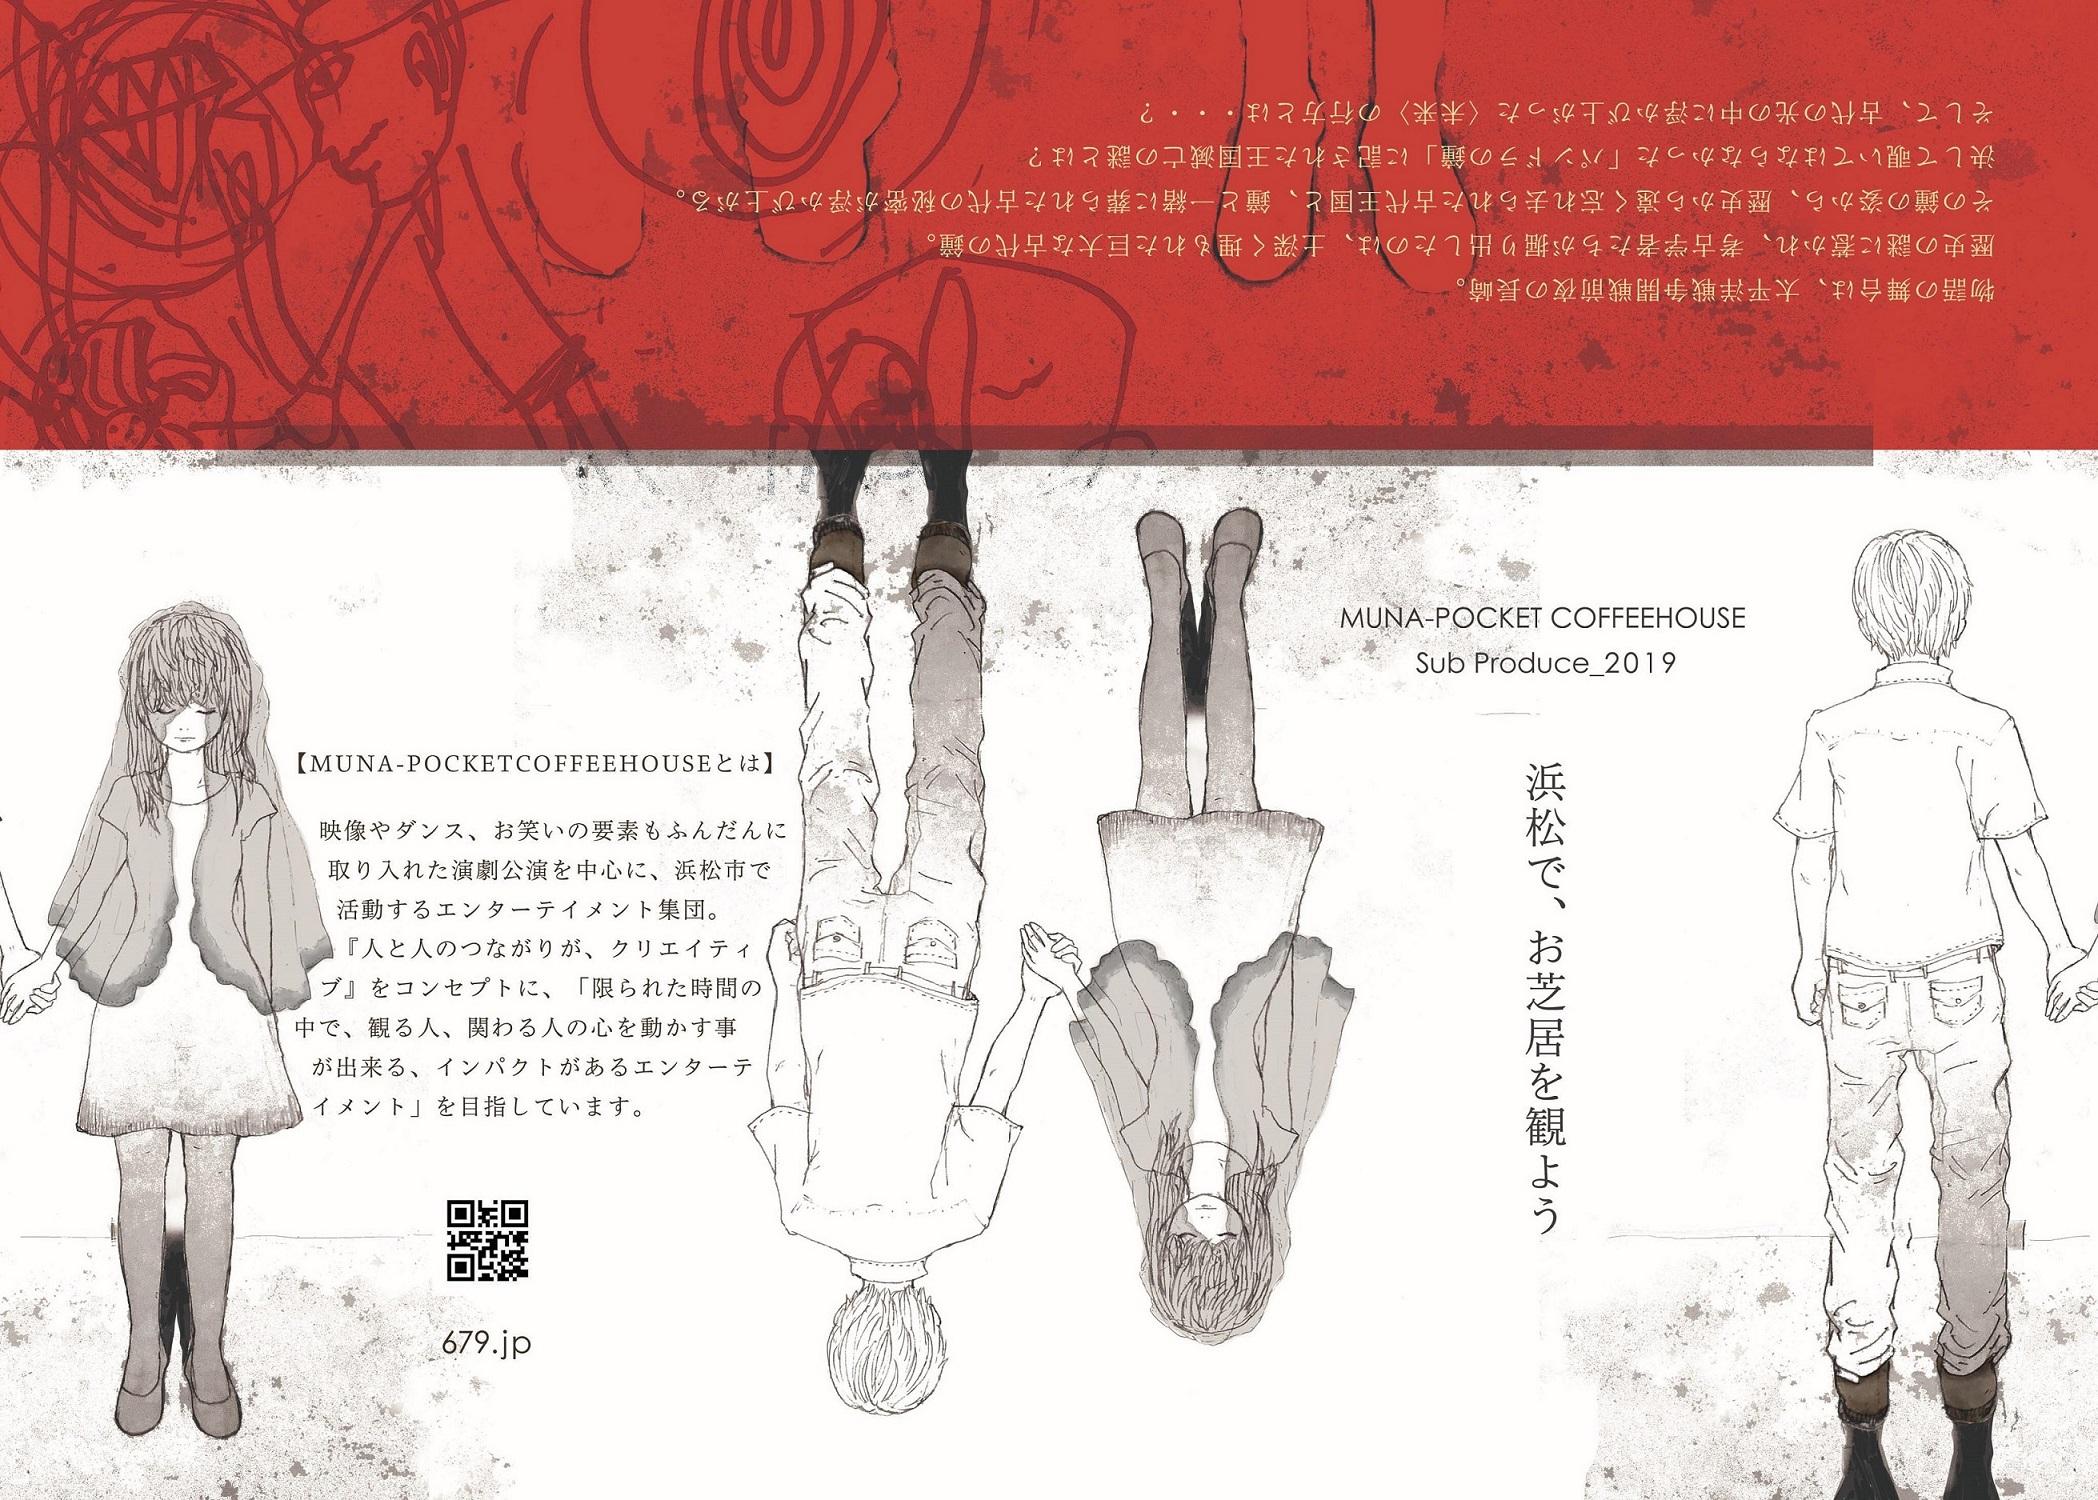 ☆WEB限定割引1回券☆6月2日(日)12:30~ MUNA-POCKET COFFEEHOUSE(ムナポケ)演劇公演「パンドラの鐘」